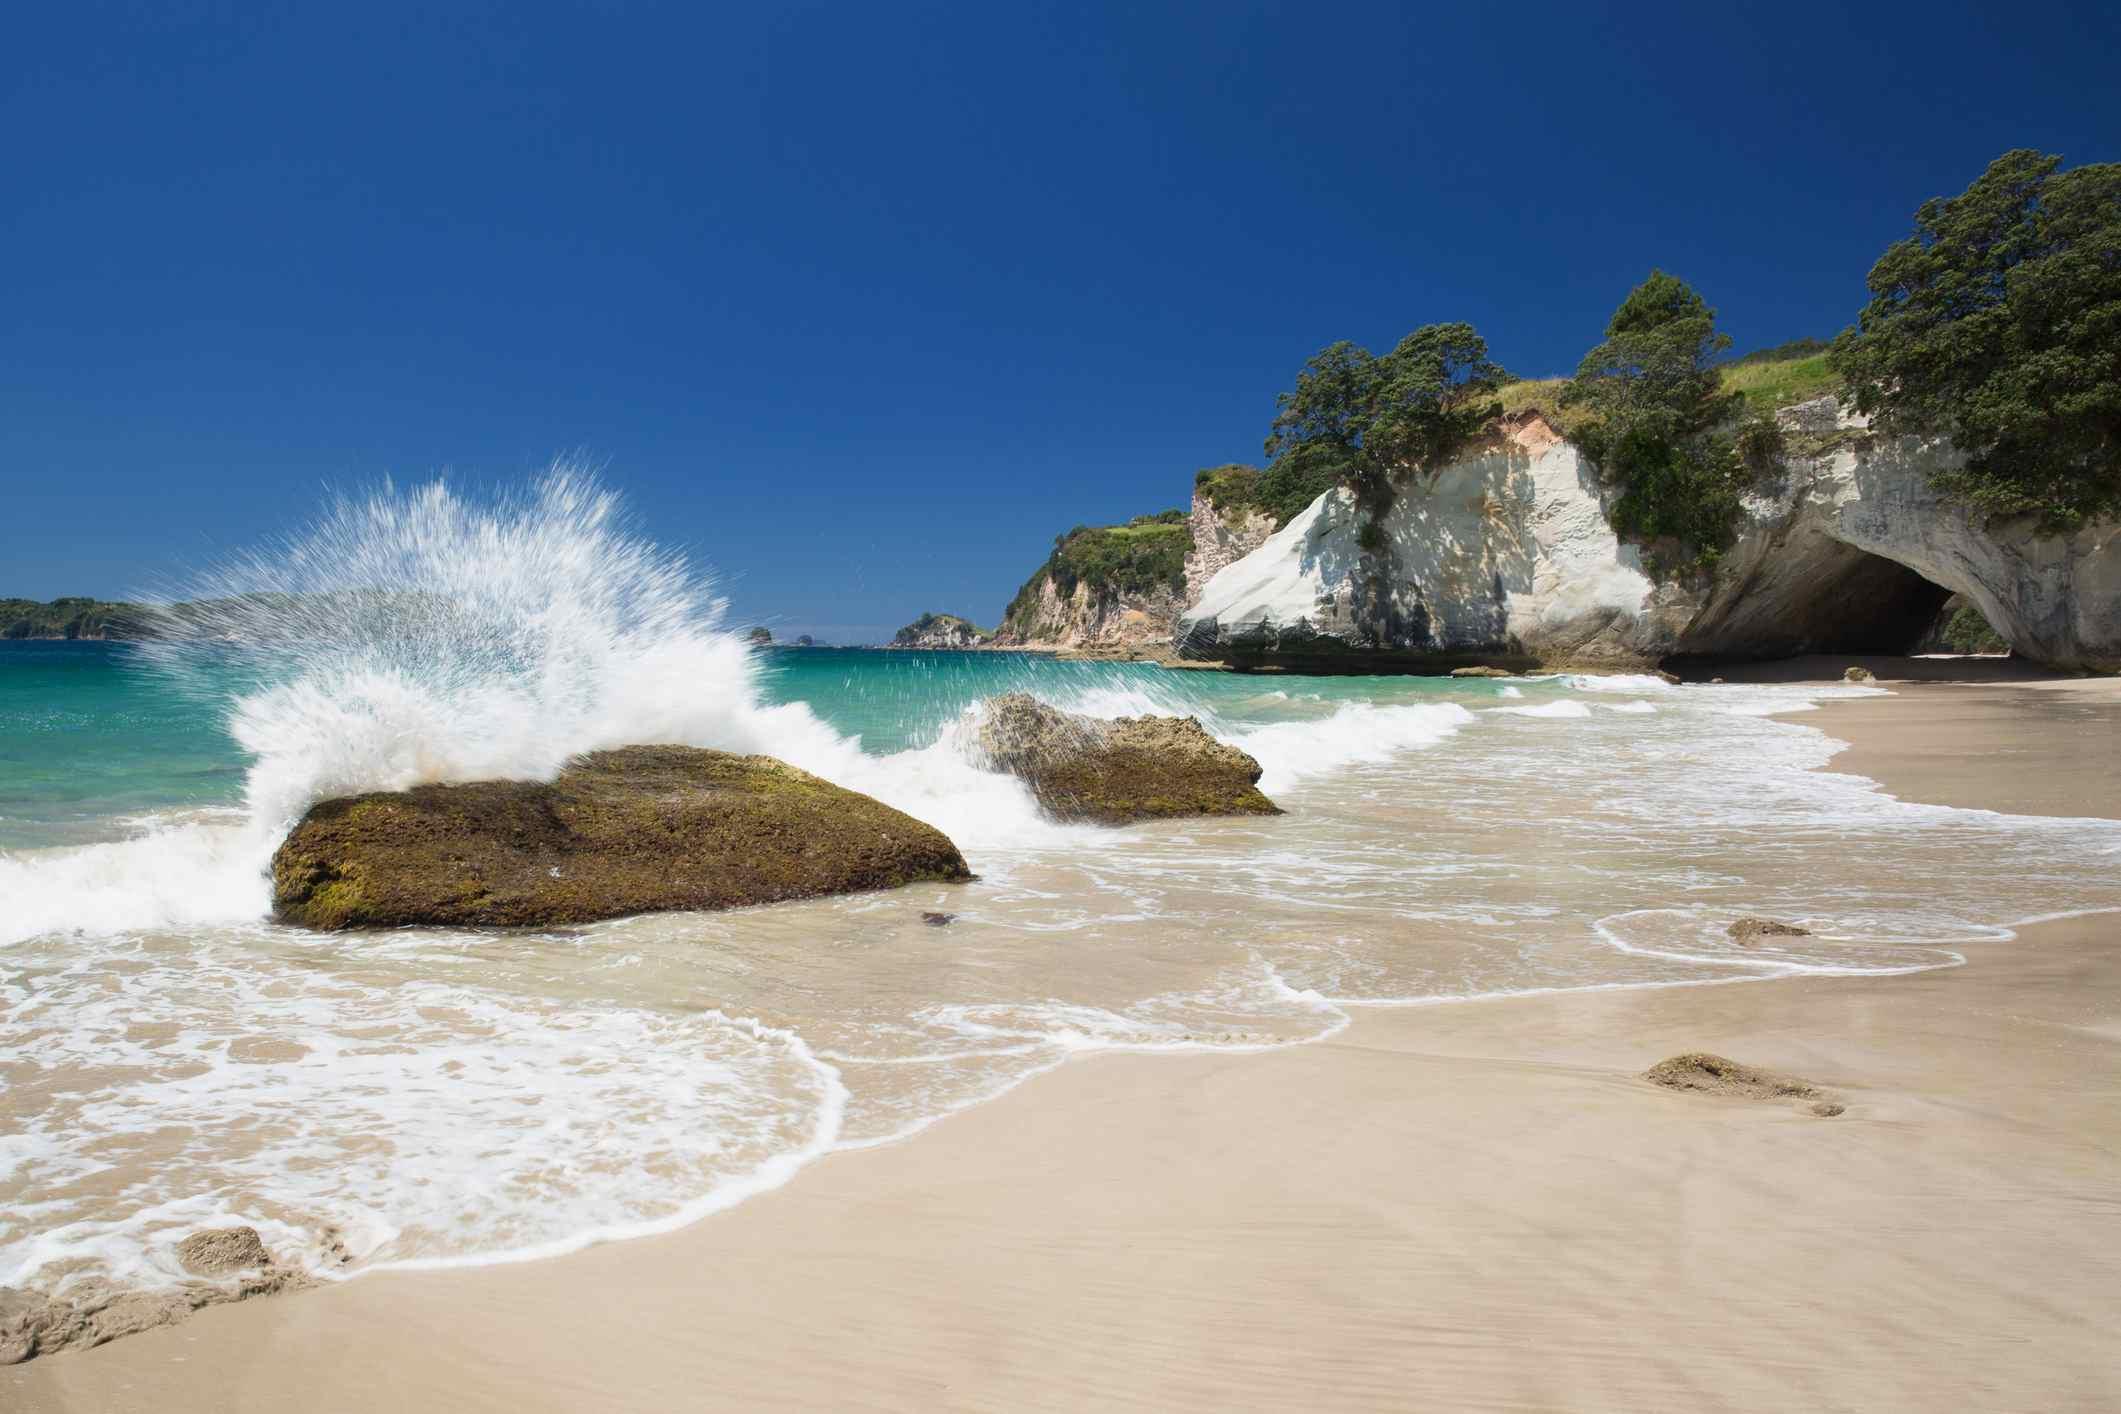 A beach in the Coromandel Peninsula, New Zealand.